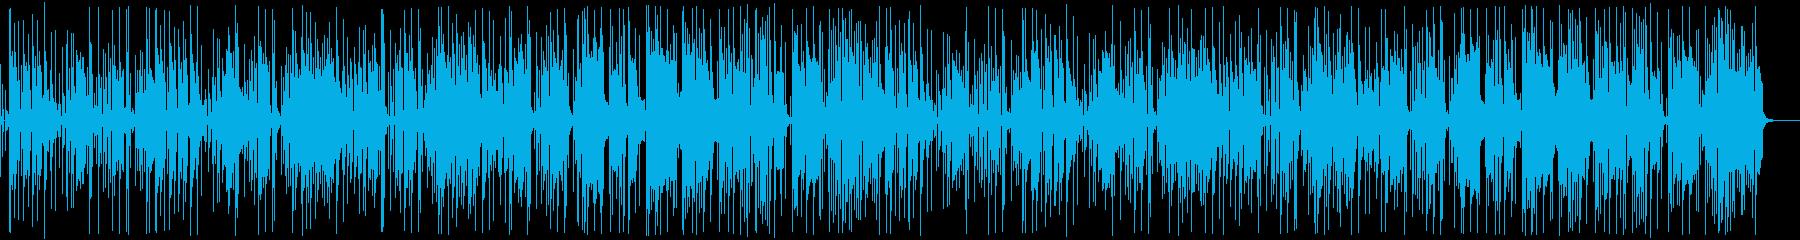 BGM_悪ガキの再生済みの波形